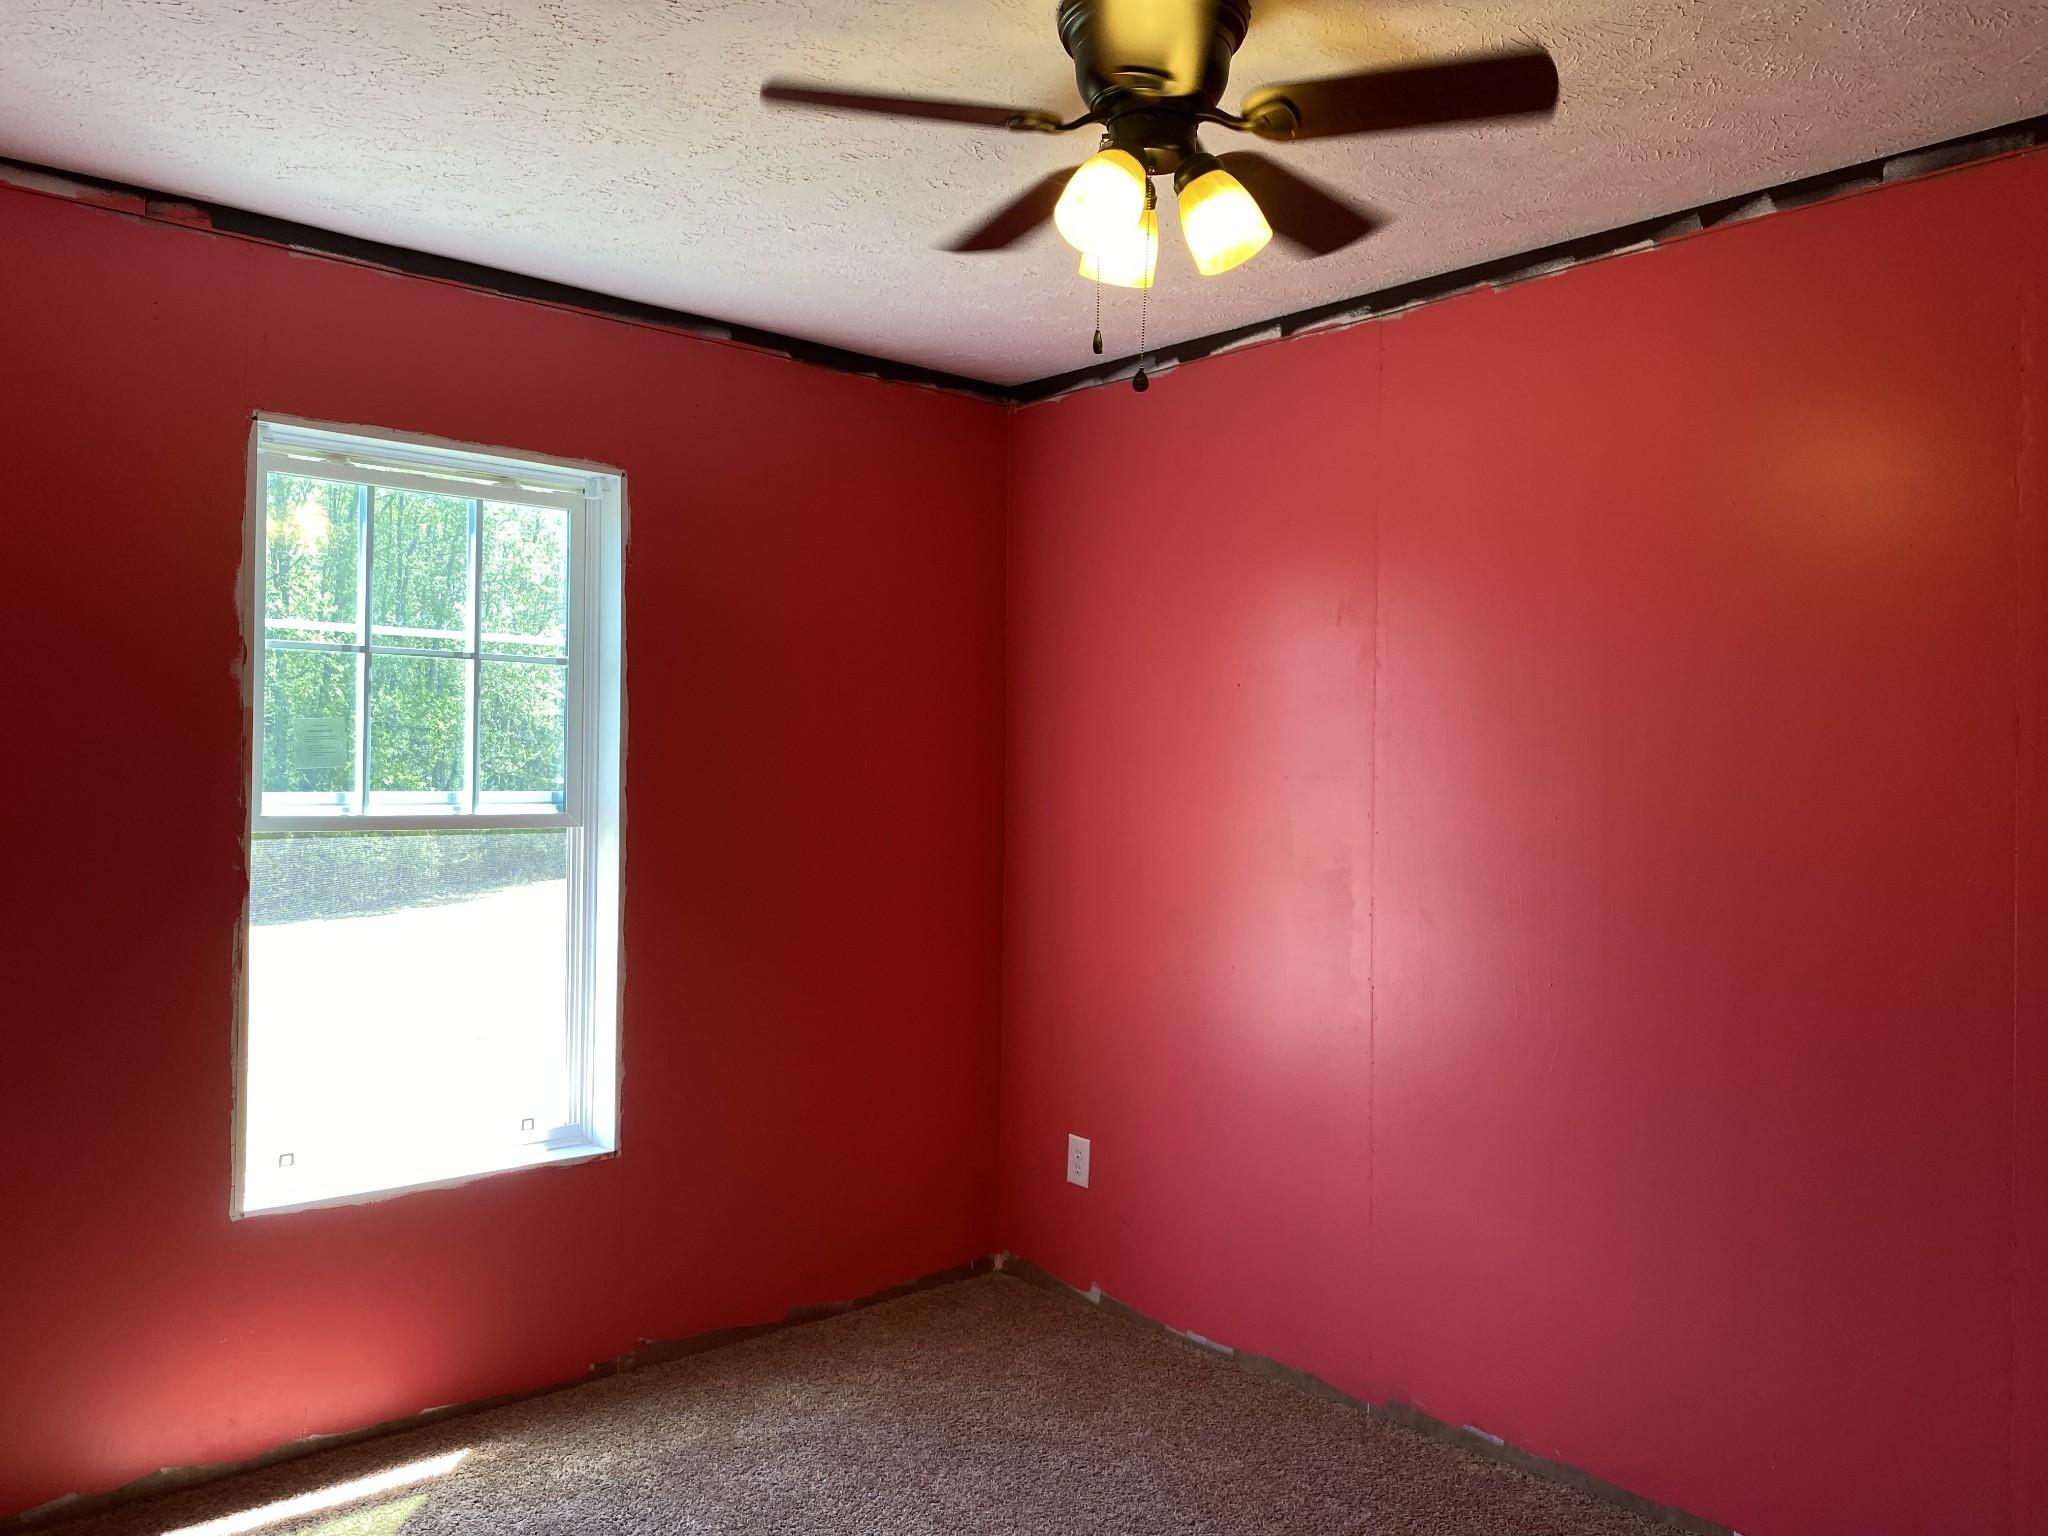 145 Abernathy Rd, Pulaski, Tennessee 38478, 3 Bedrooms Bedrooms, ,2 BathroomsBathrooms,Residential,For Sale,145 Abernathy Rd,1,2244969